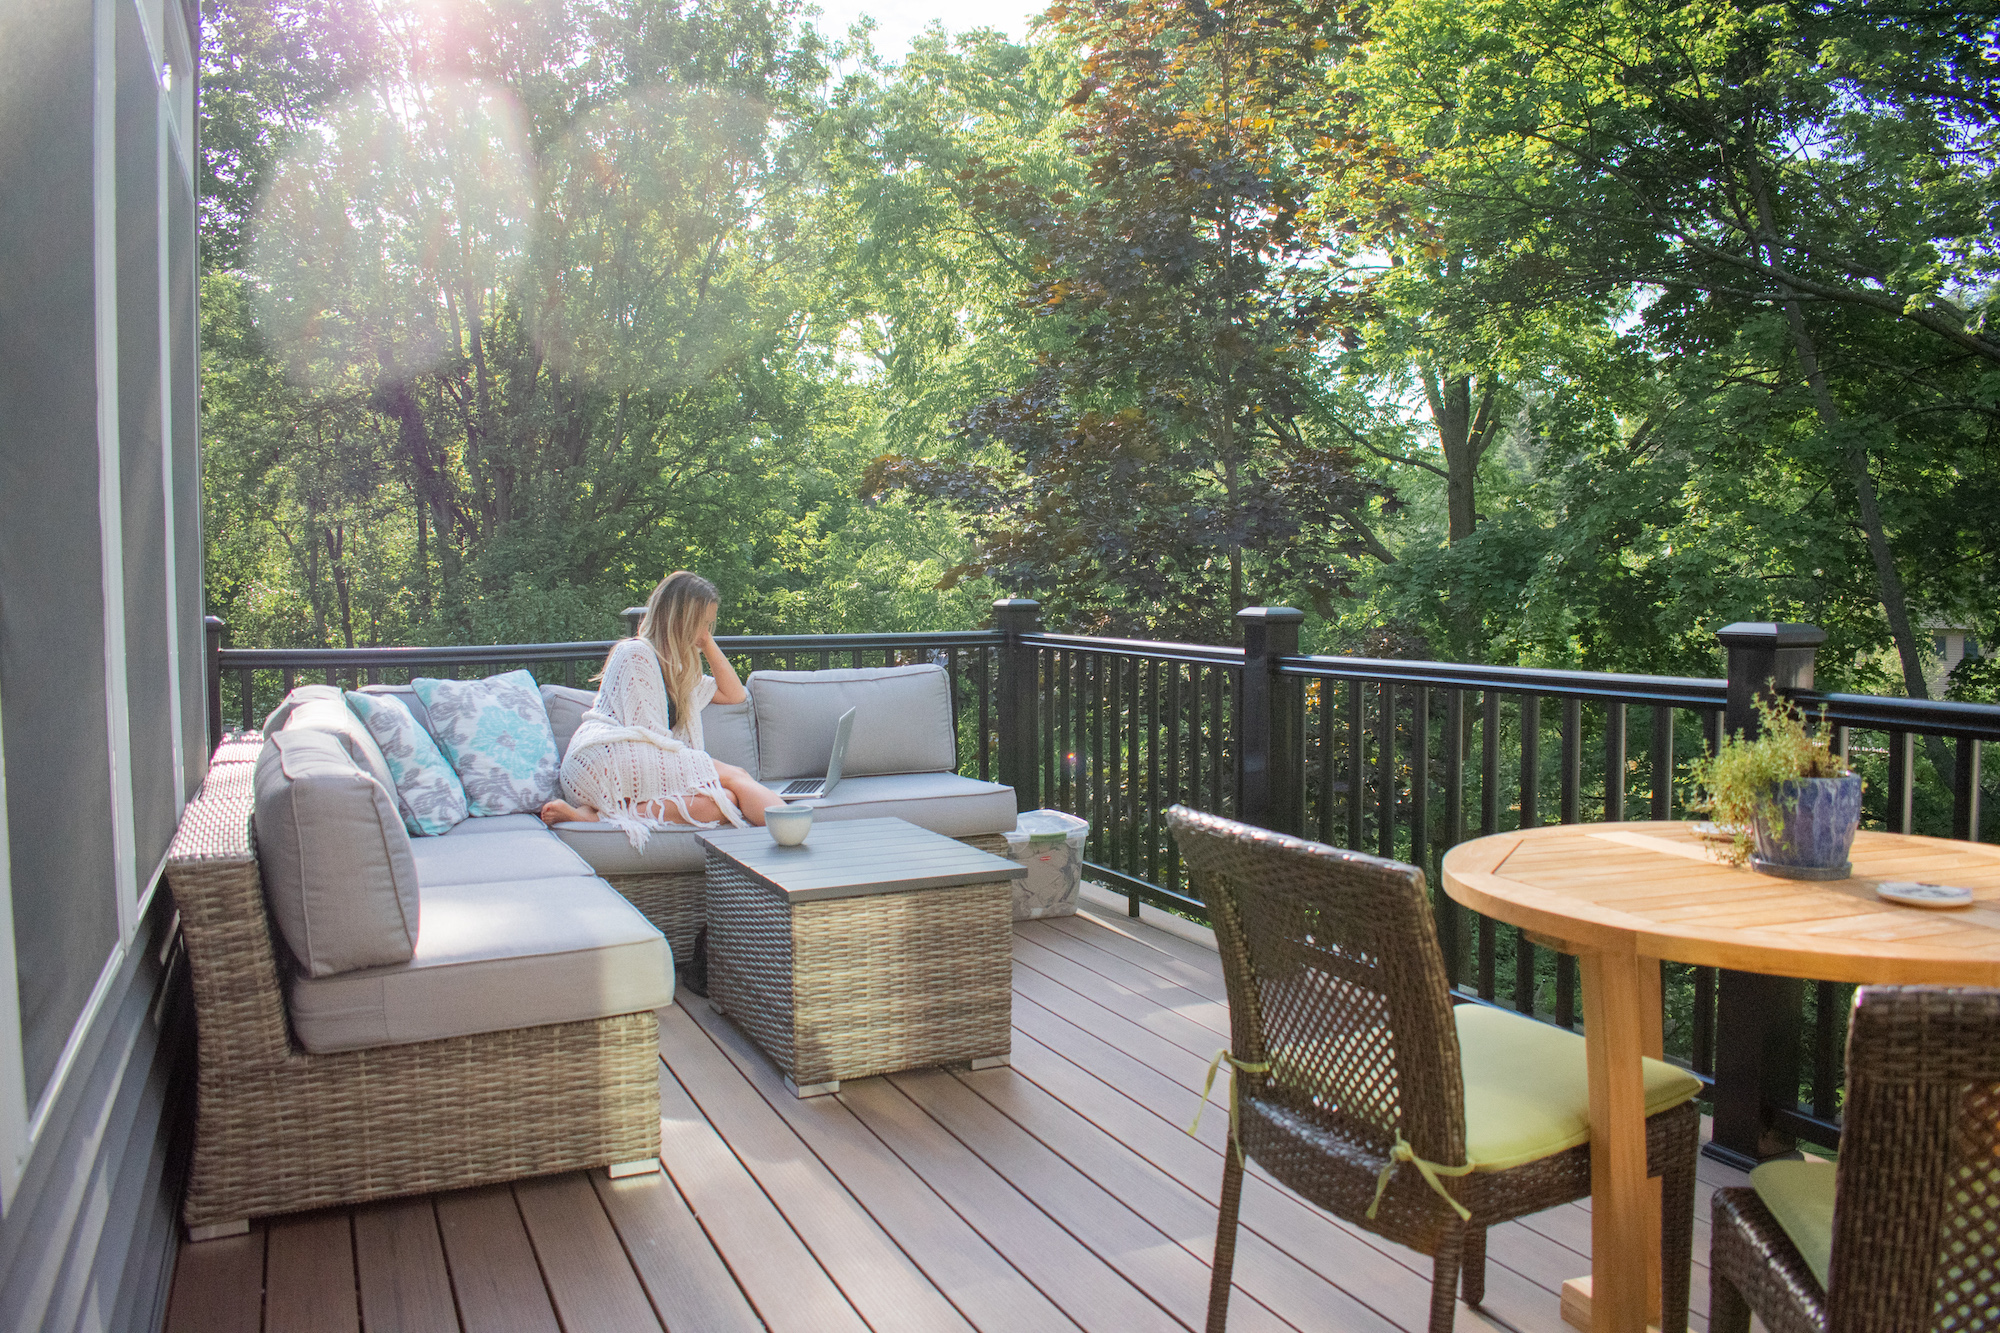 Morning Patio Home Inspiration